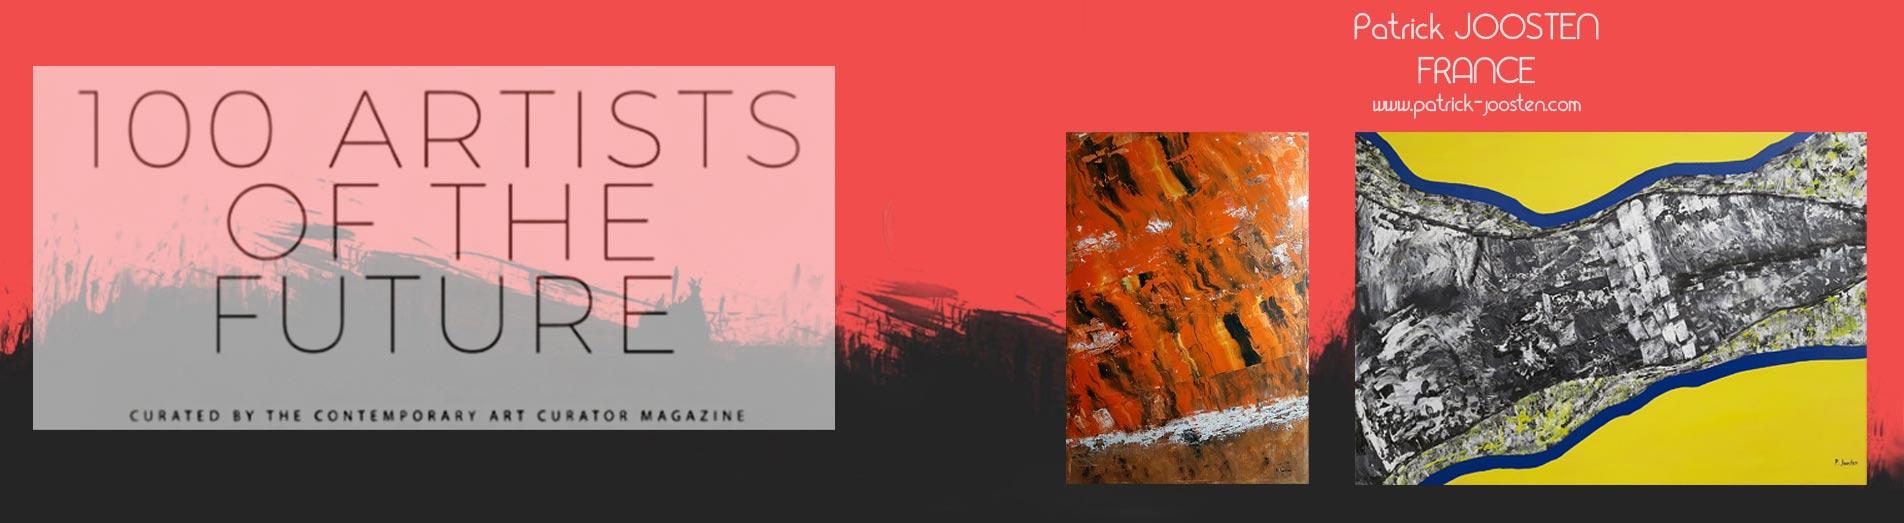 100 Artists f the Future, Patrick Joosten